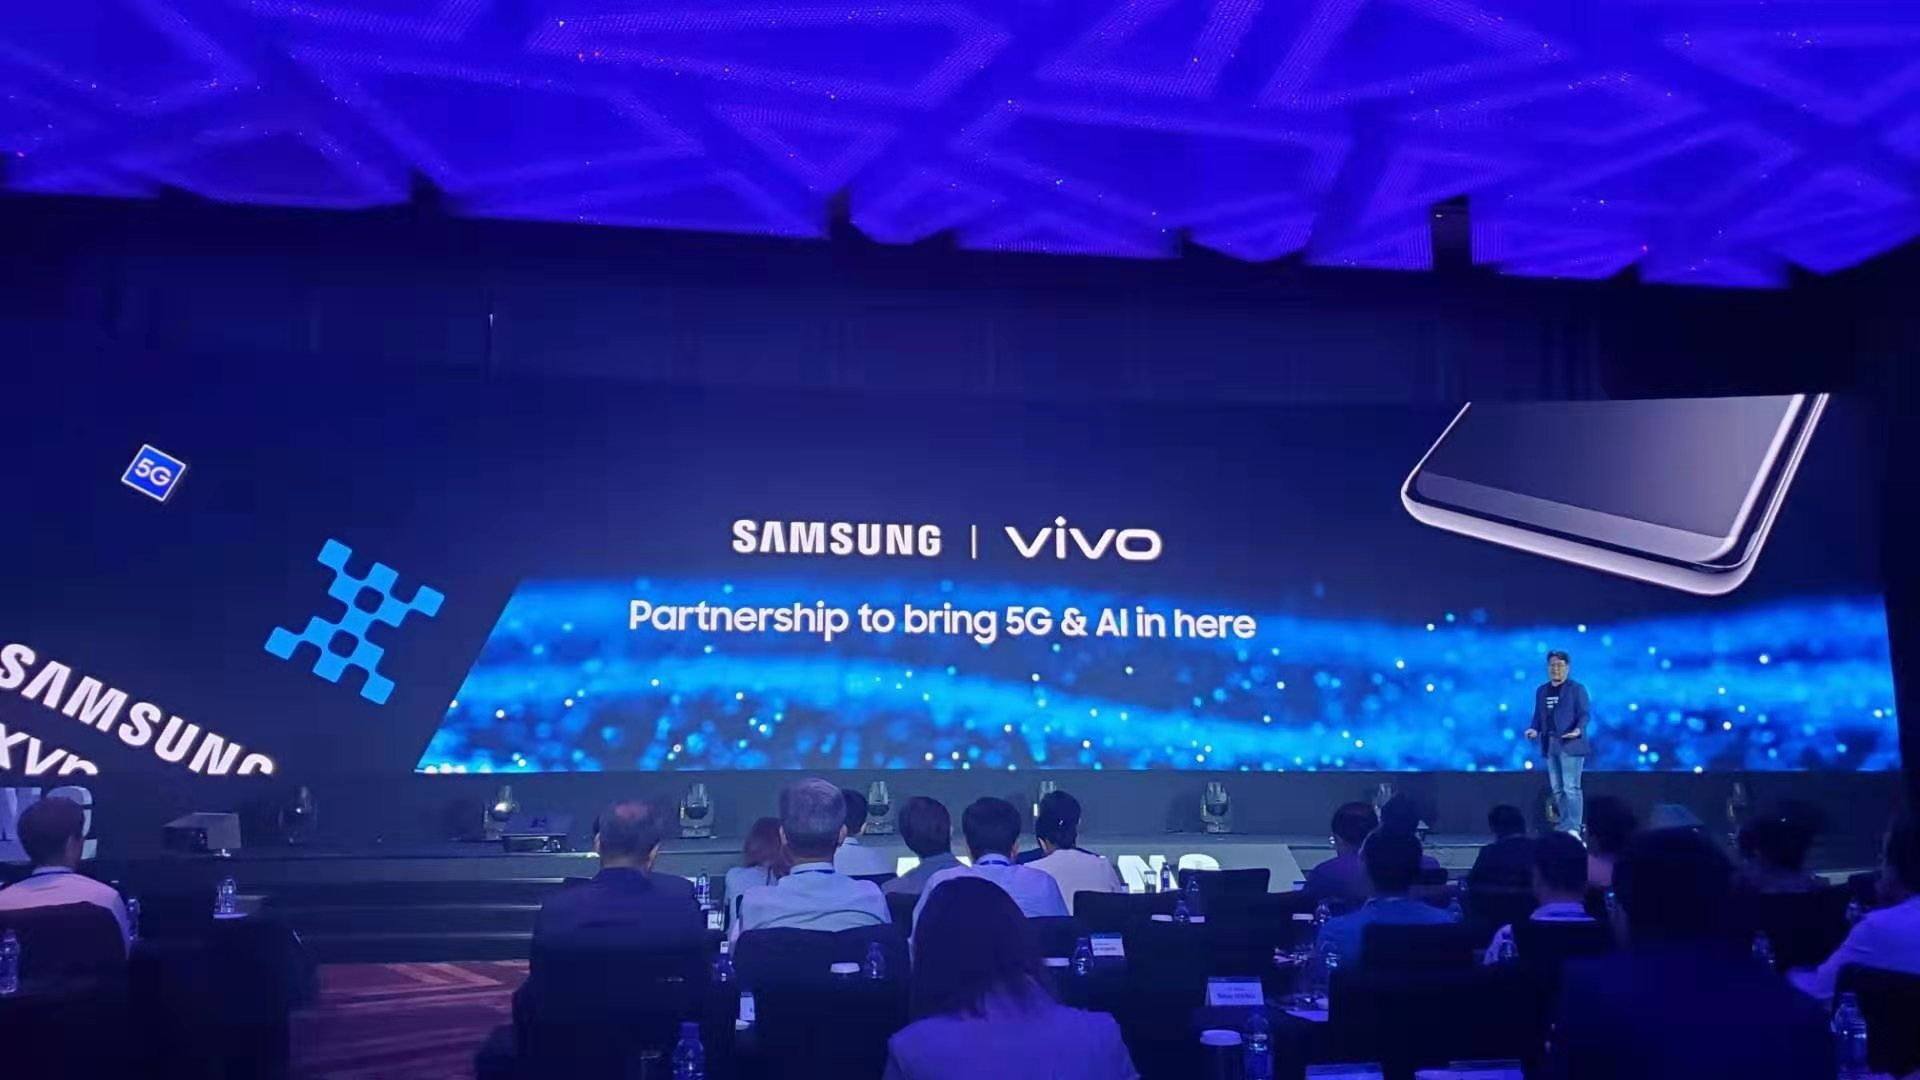 vivoがSamsung Exynos 980の採用を明らかに、5G市場の覇権争い進む